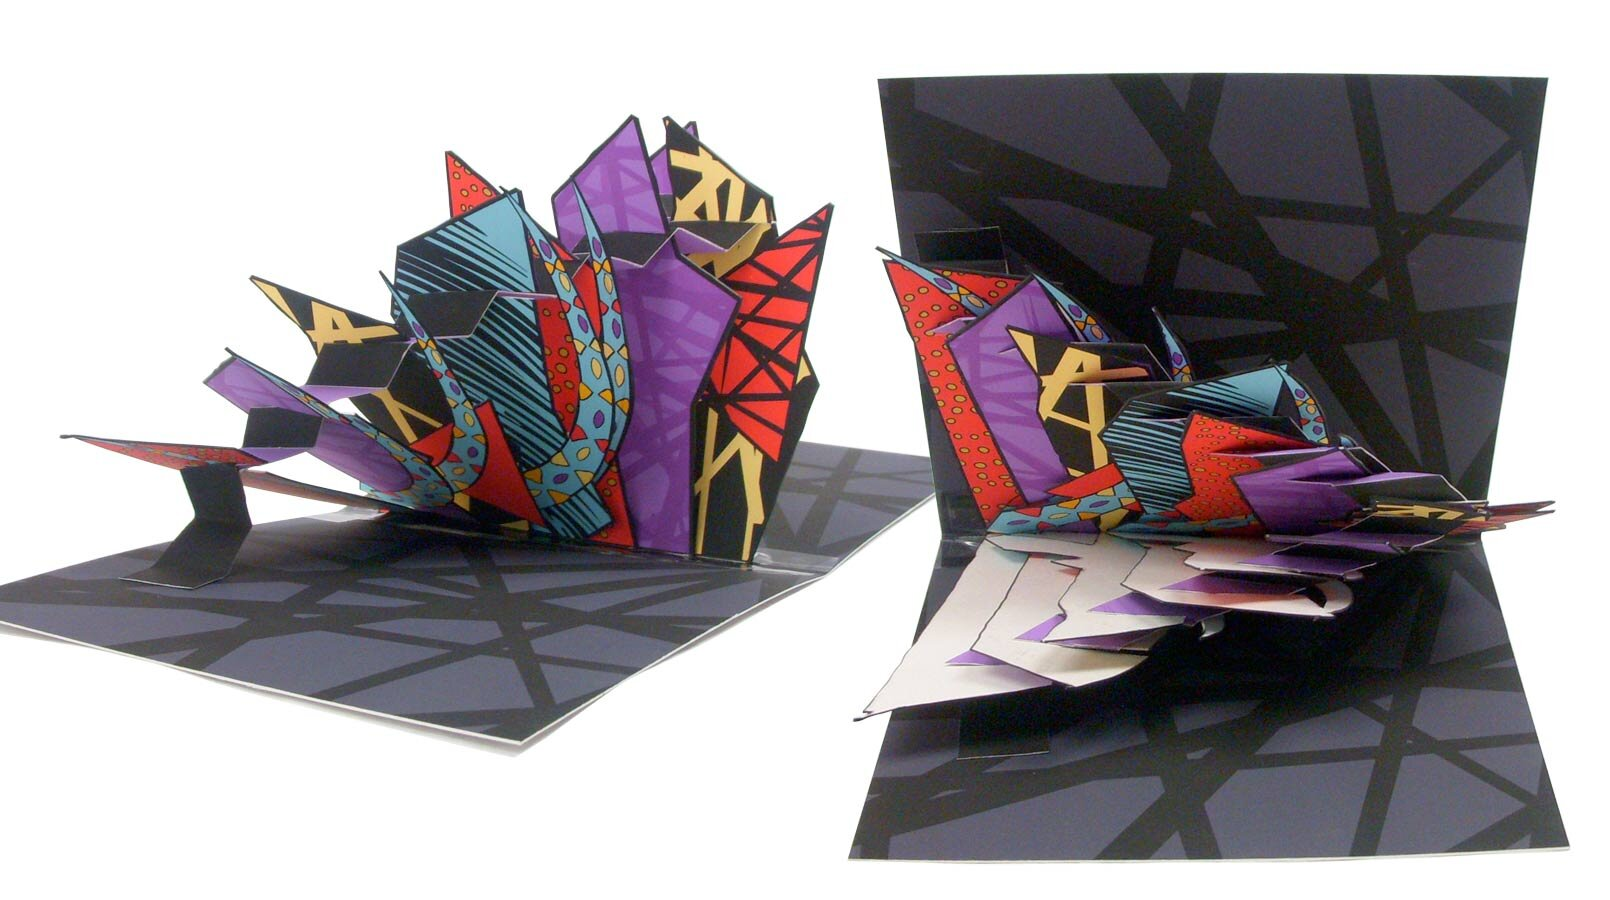 Barneys-New-York-Lady-Gaga-Design-Packaging-3.3.jpg